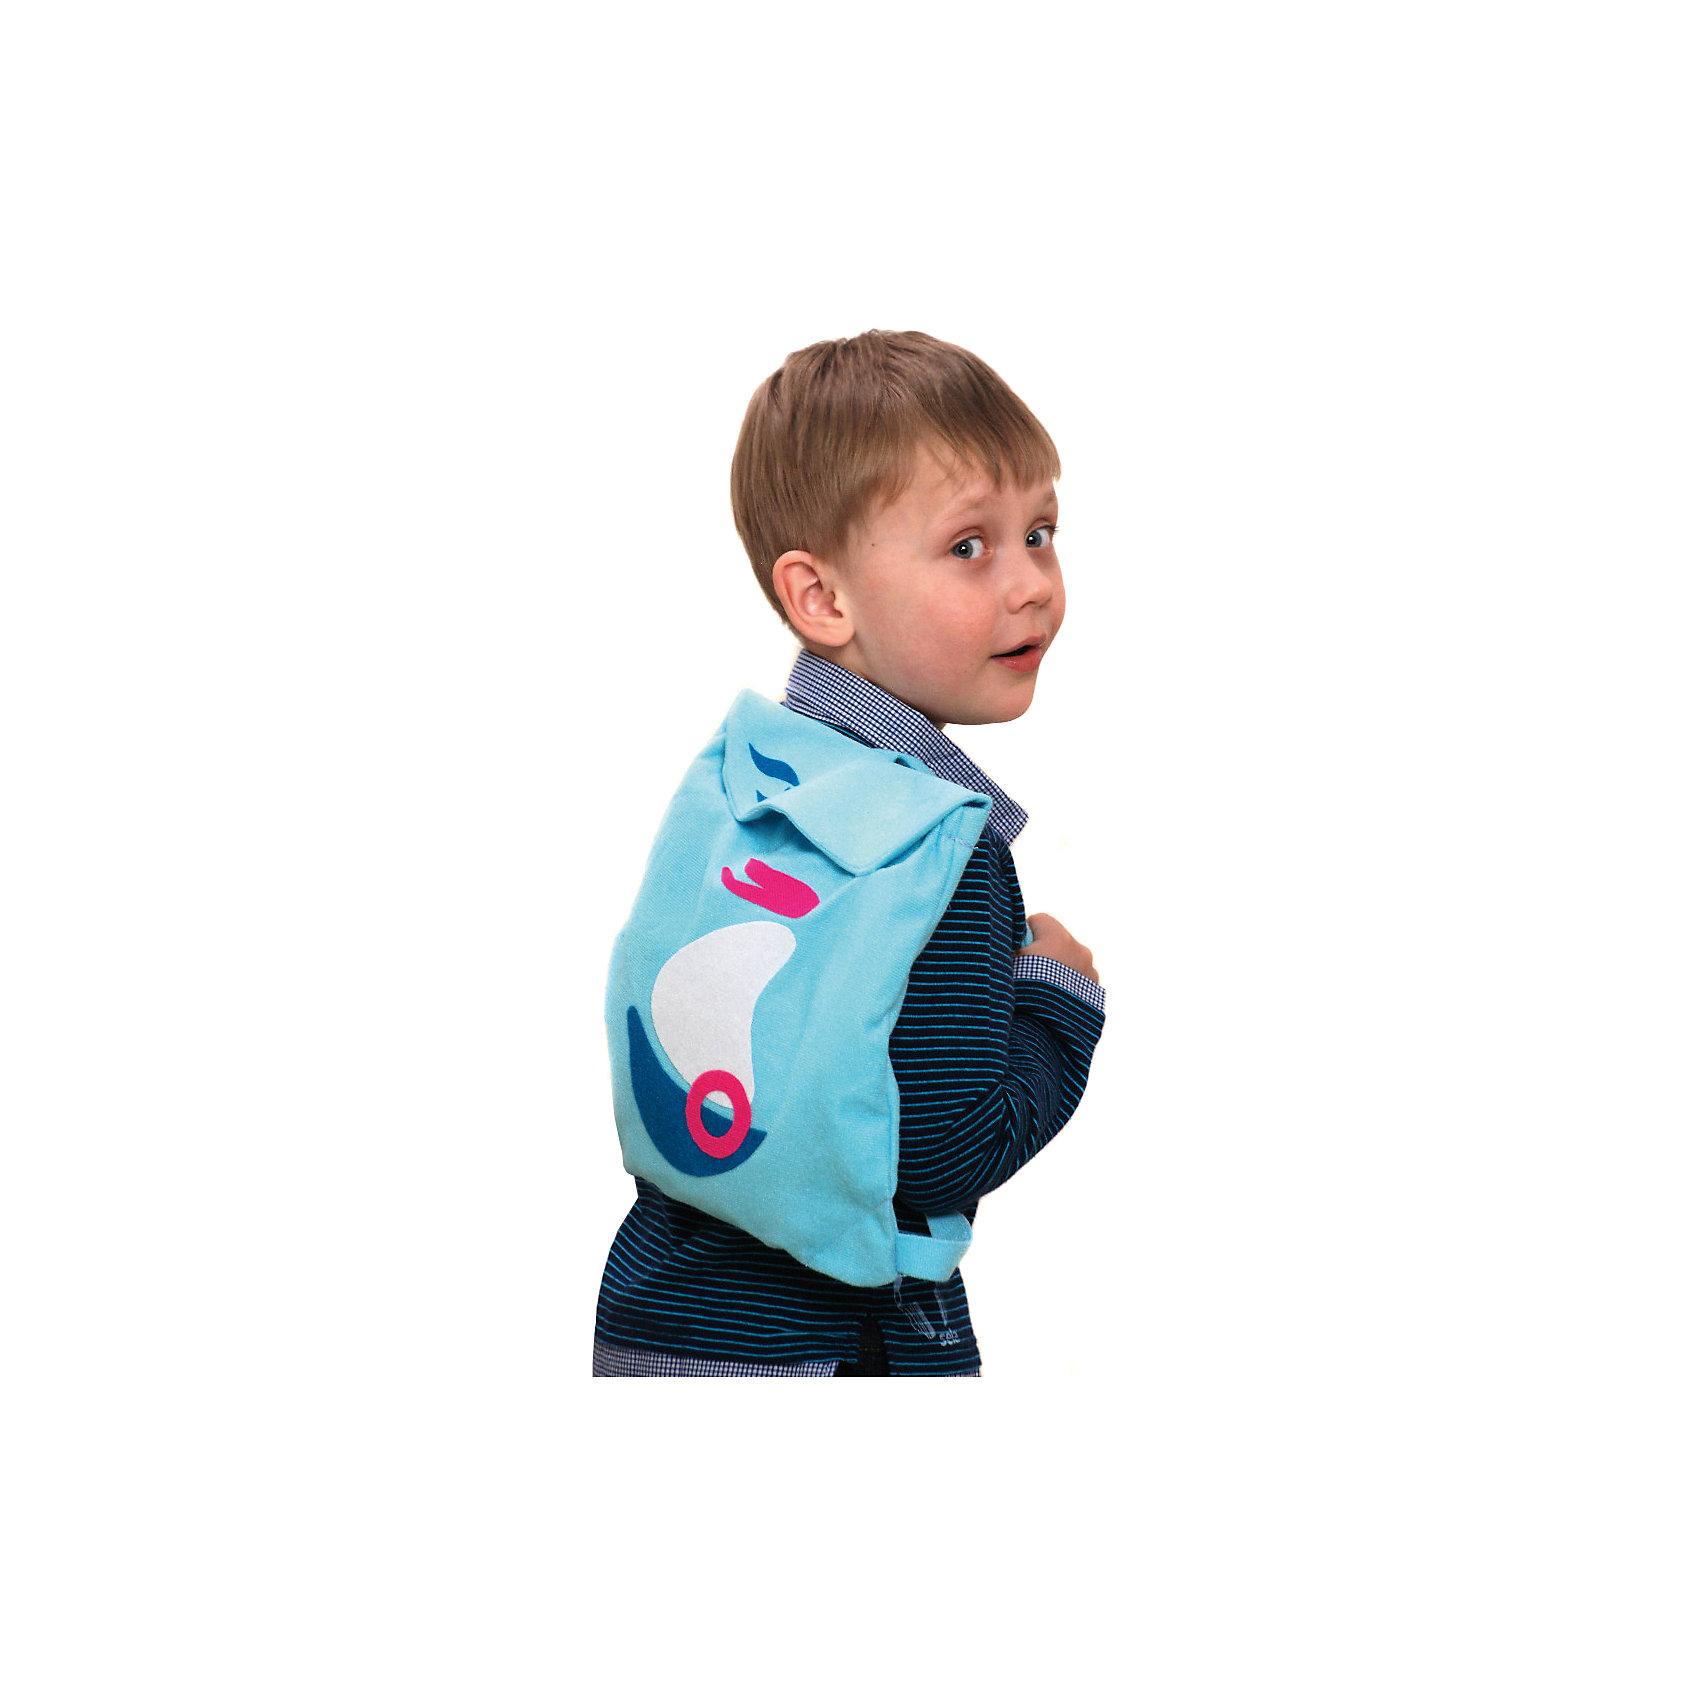 STIGIS Стигис-аппликация Рюкзак детский, голубой stigis стигис аппликация царевна лягушка